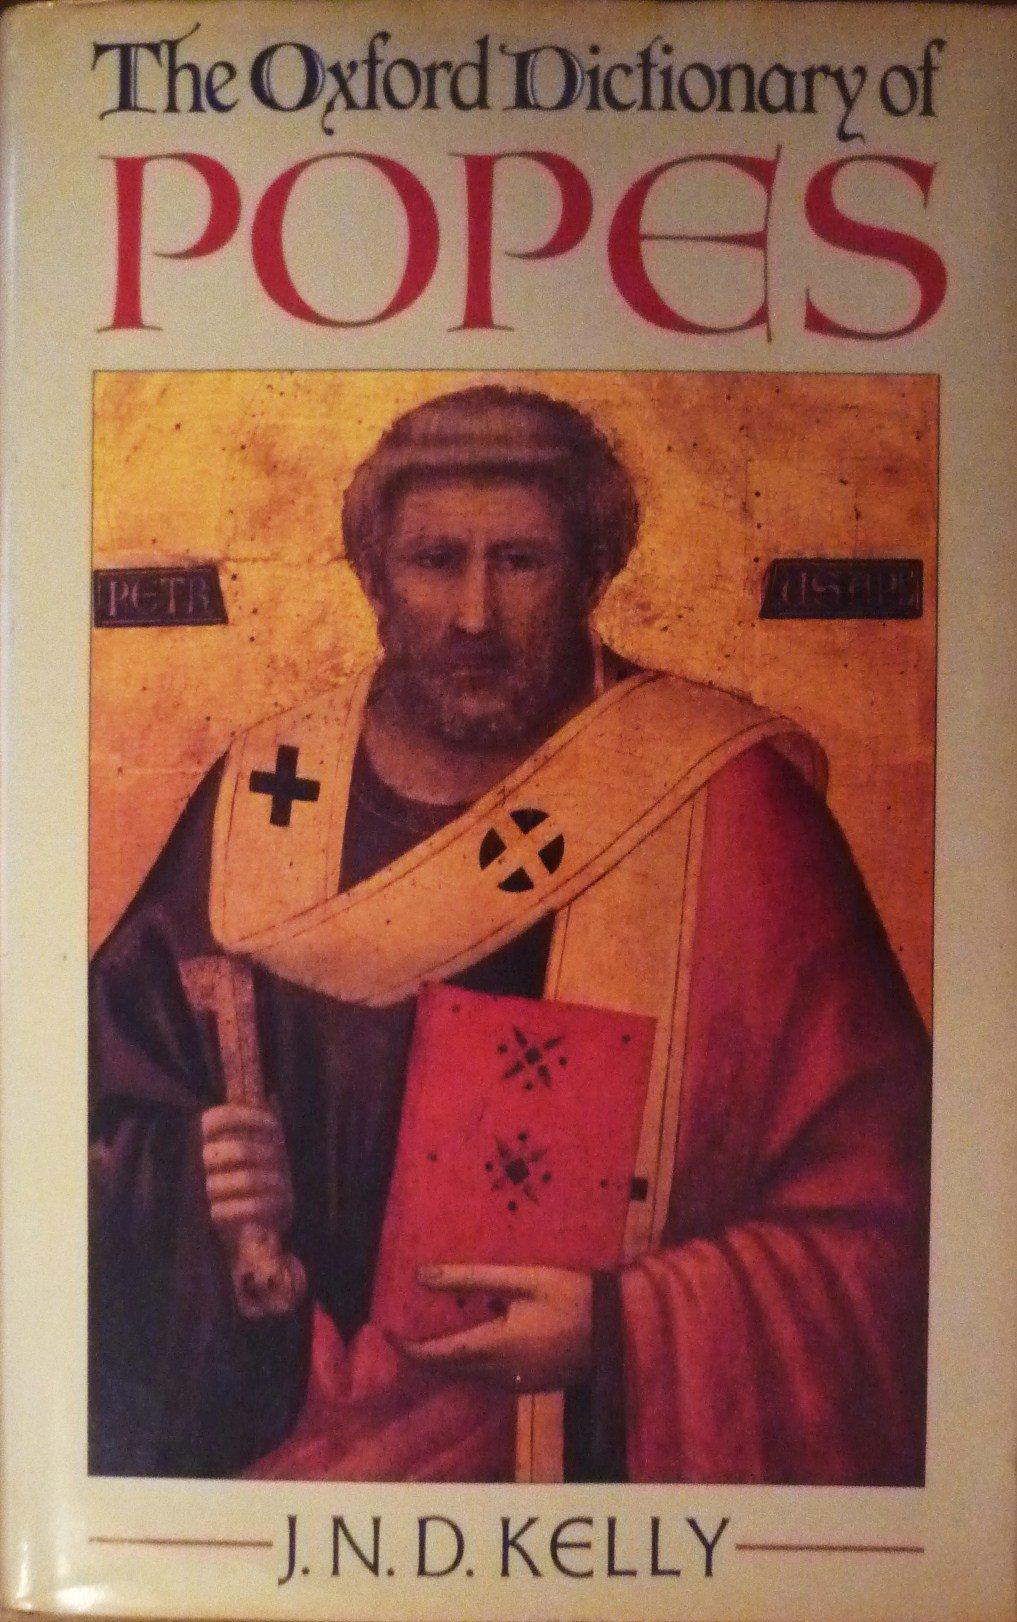 Joan pdf pope